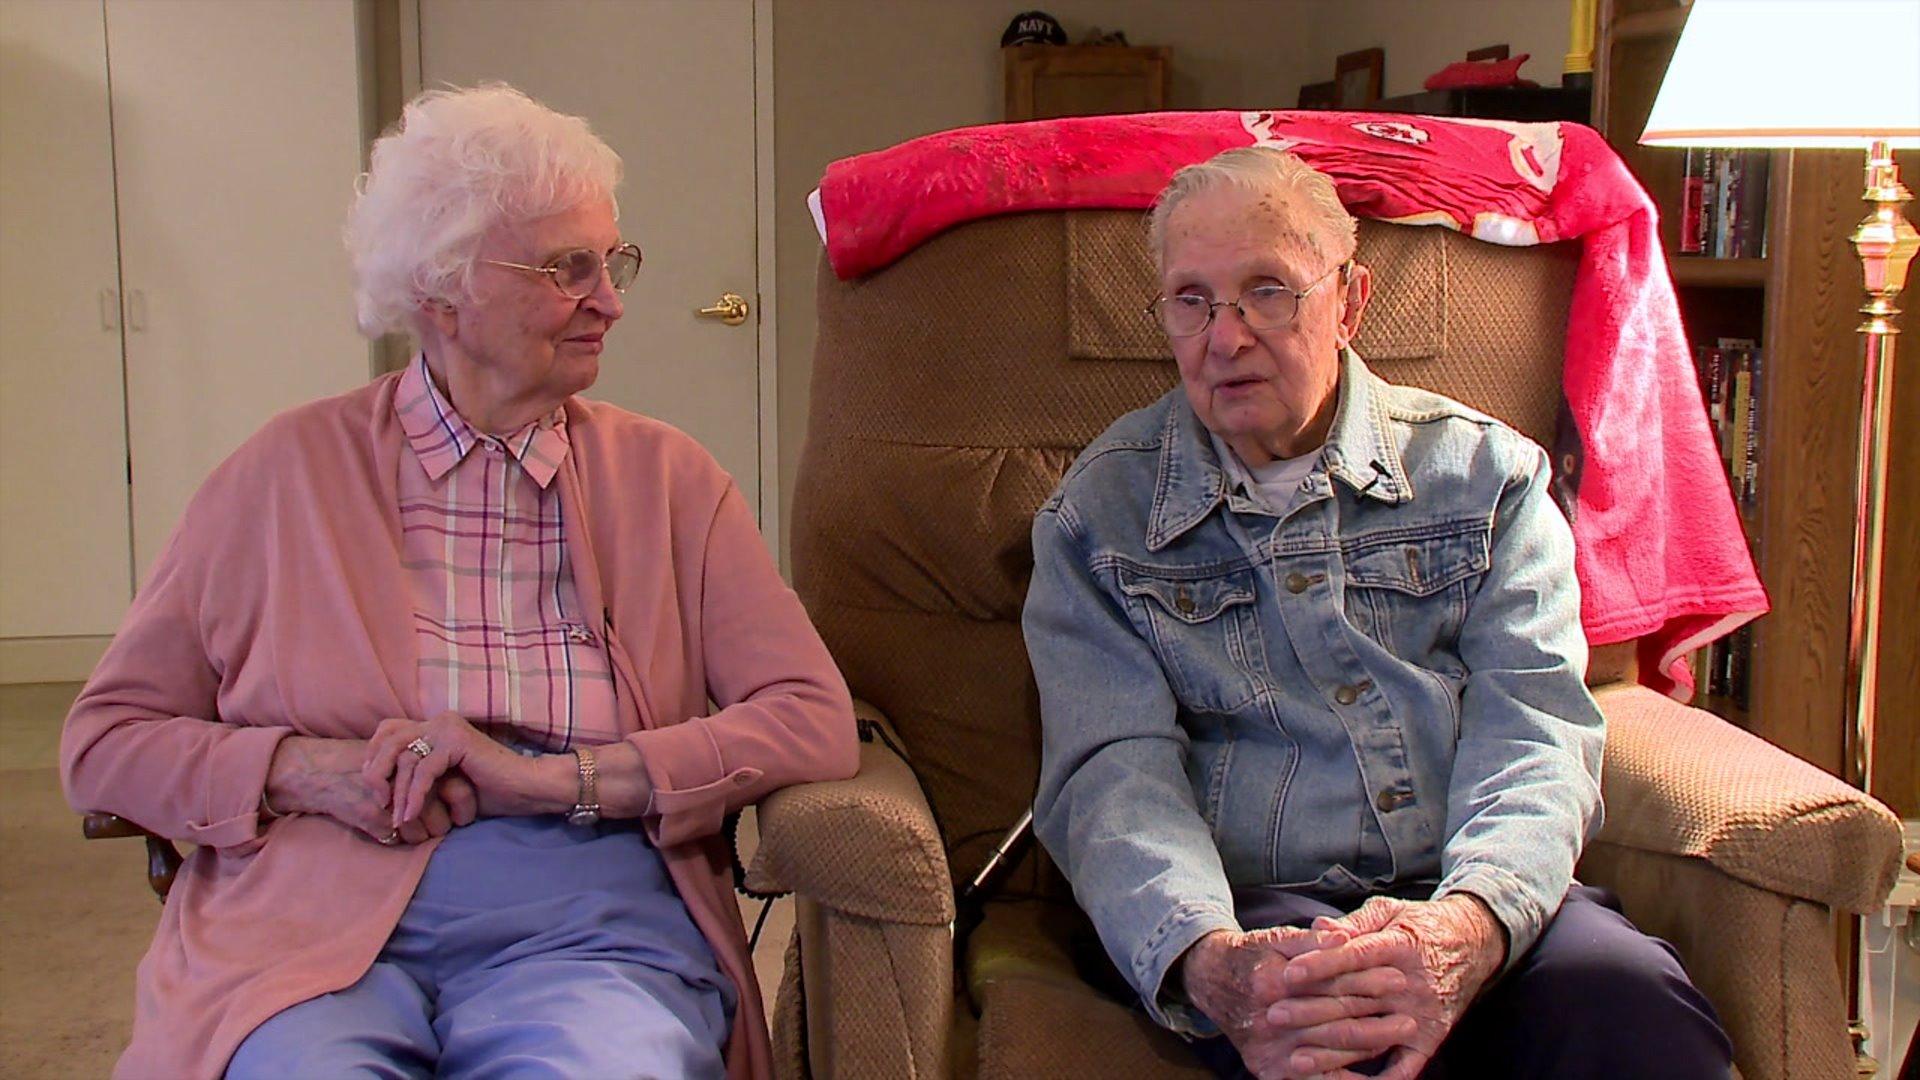 Valentine's Day marks Russel and Carol Brandsma's 75th wedding anniversary.